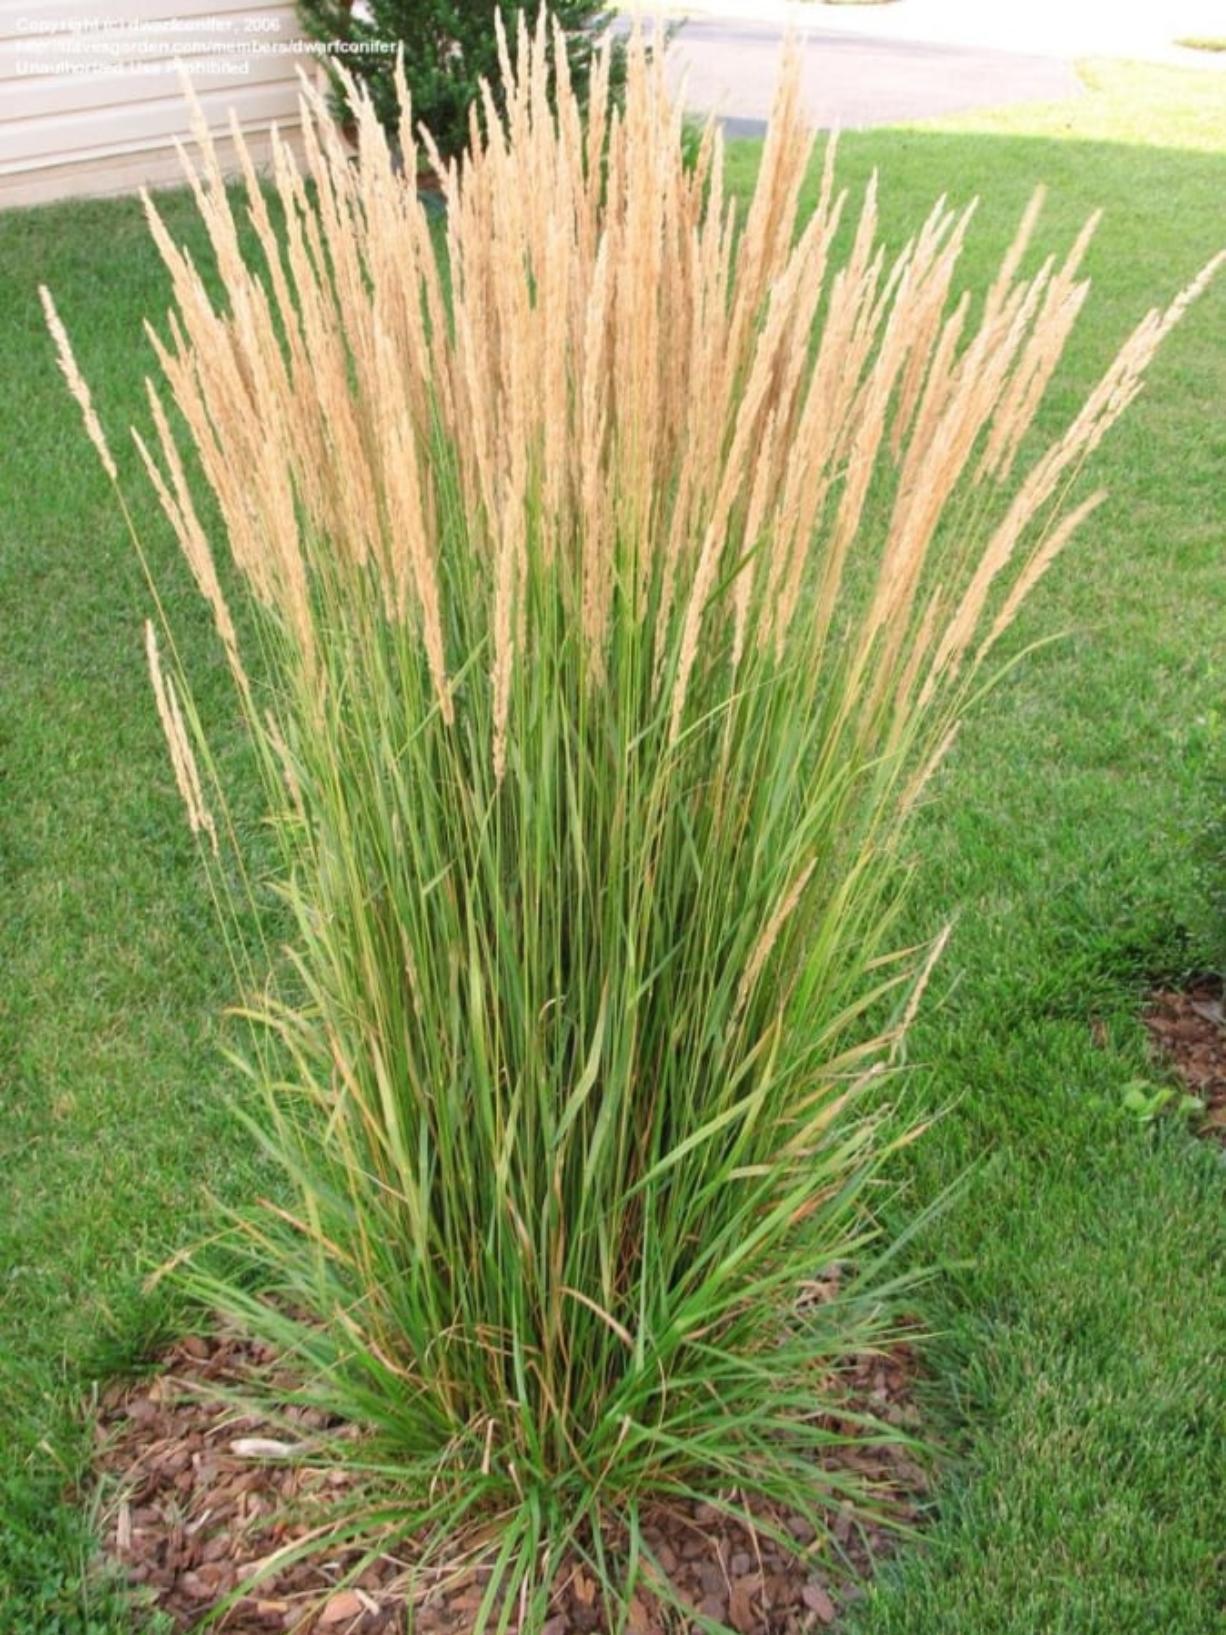 Gardening With Allen Ornamental Grasses Enhance Yard Columbian Com